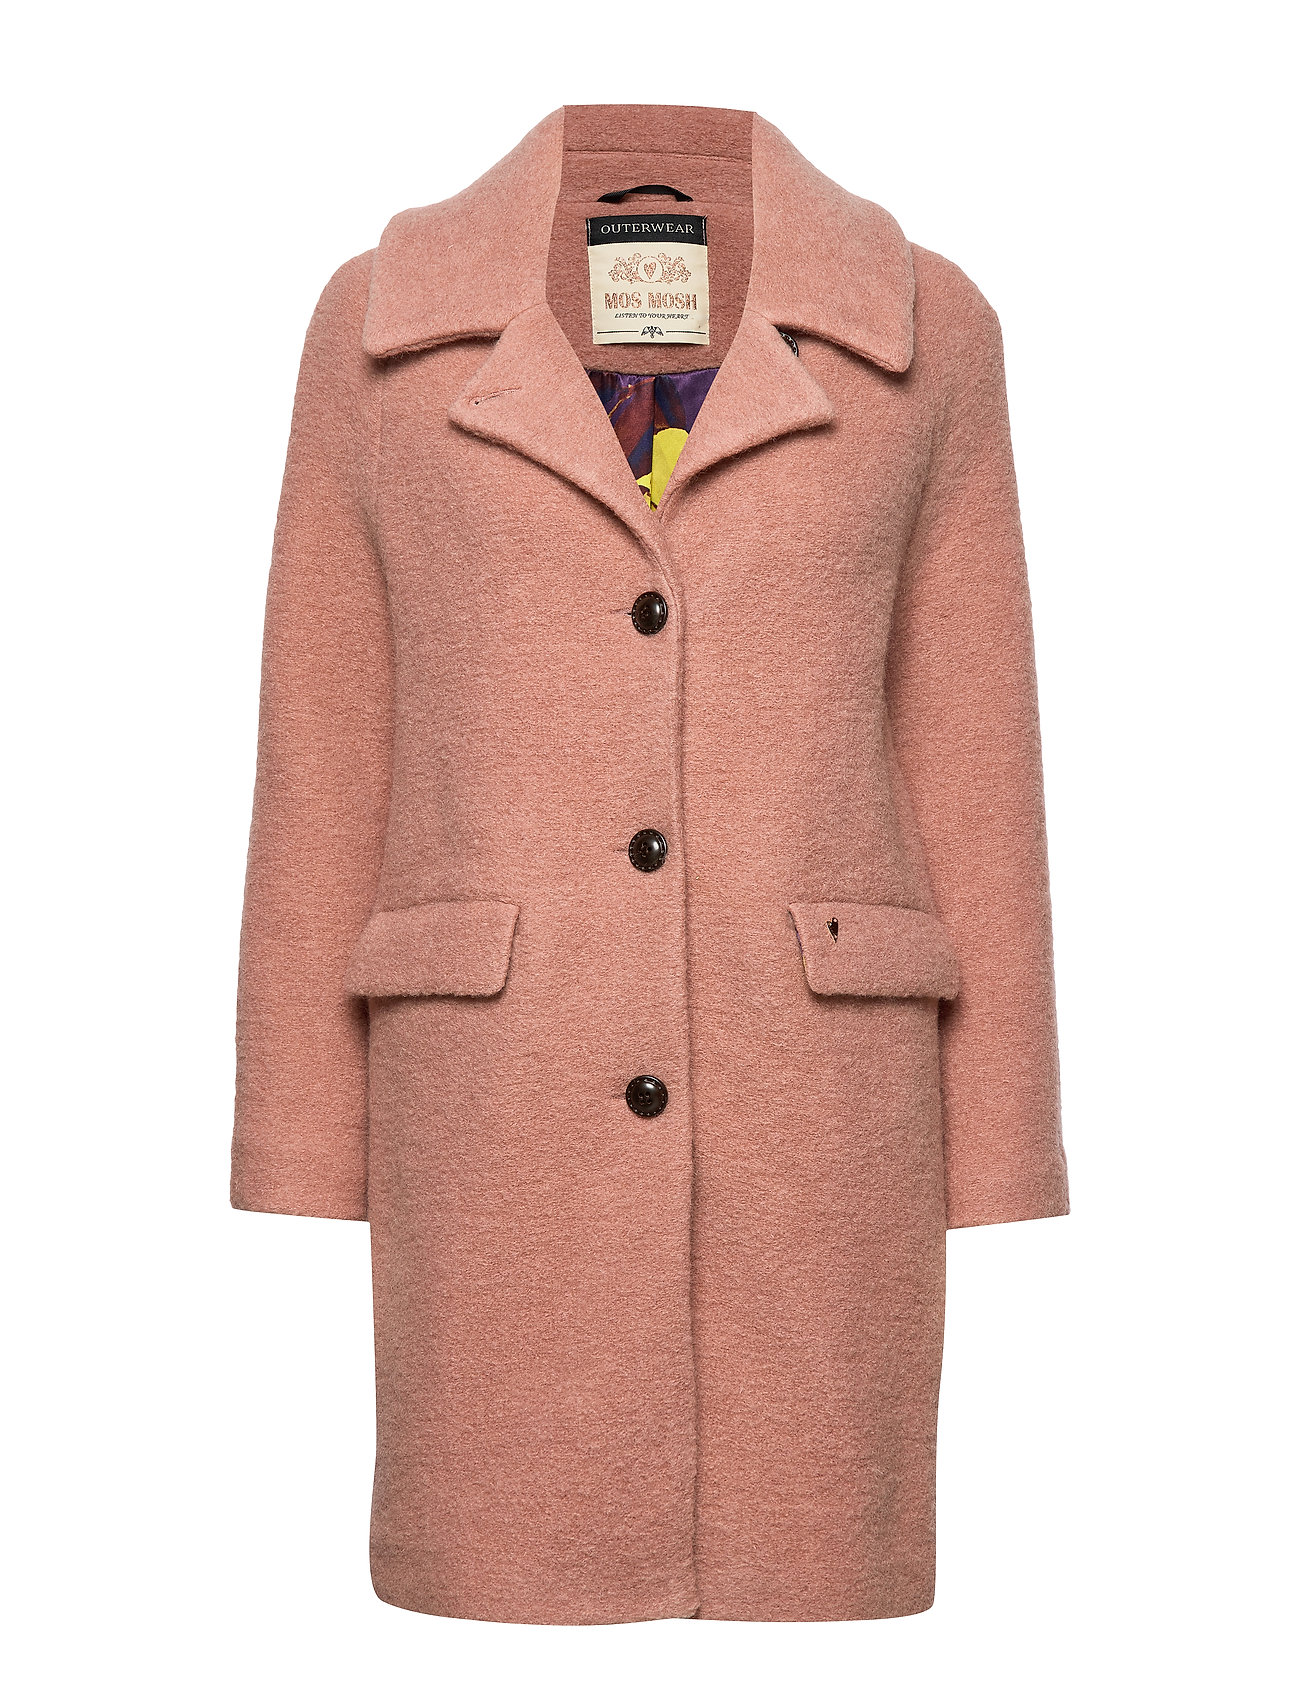 MOS MOSH Manny Wool Coat - VINTAGE ROSE